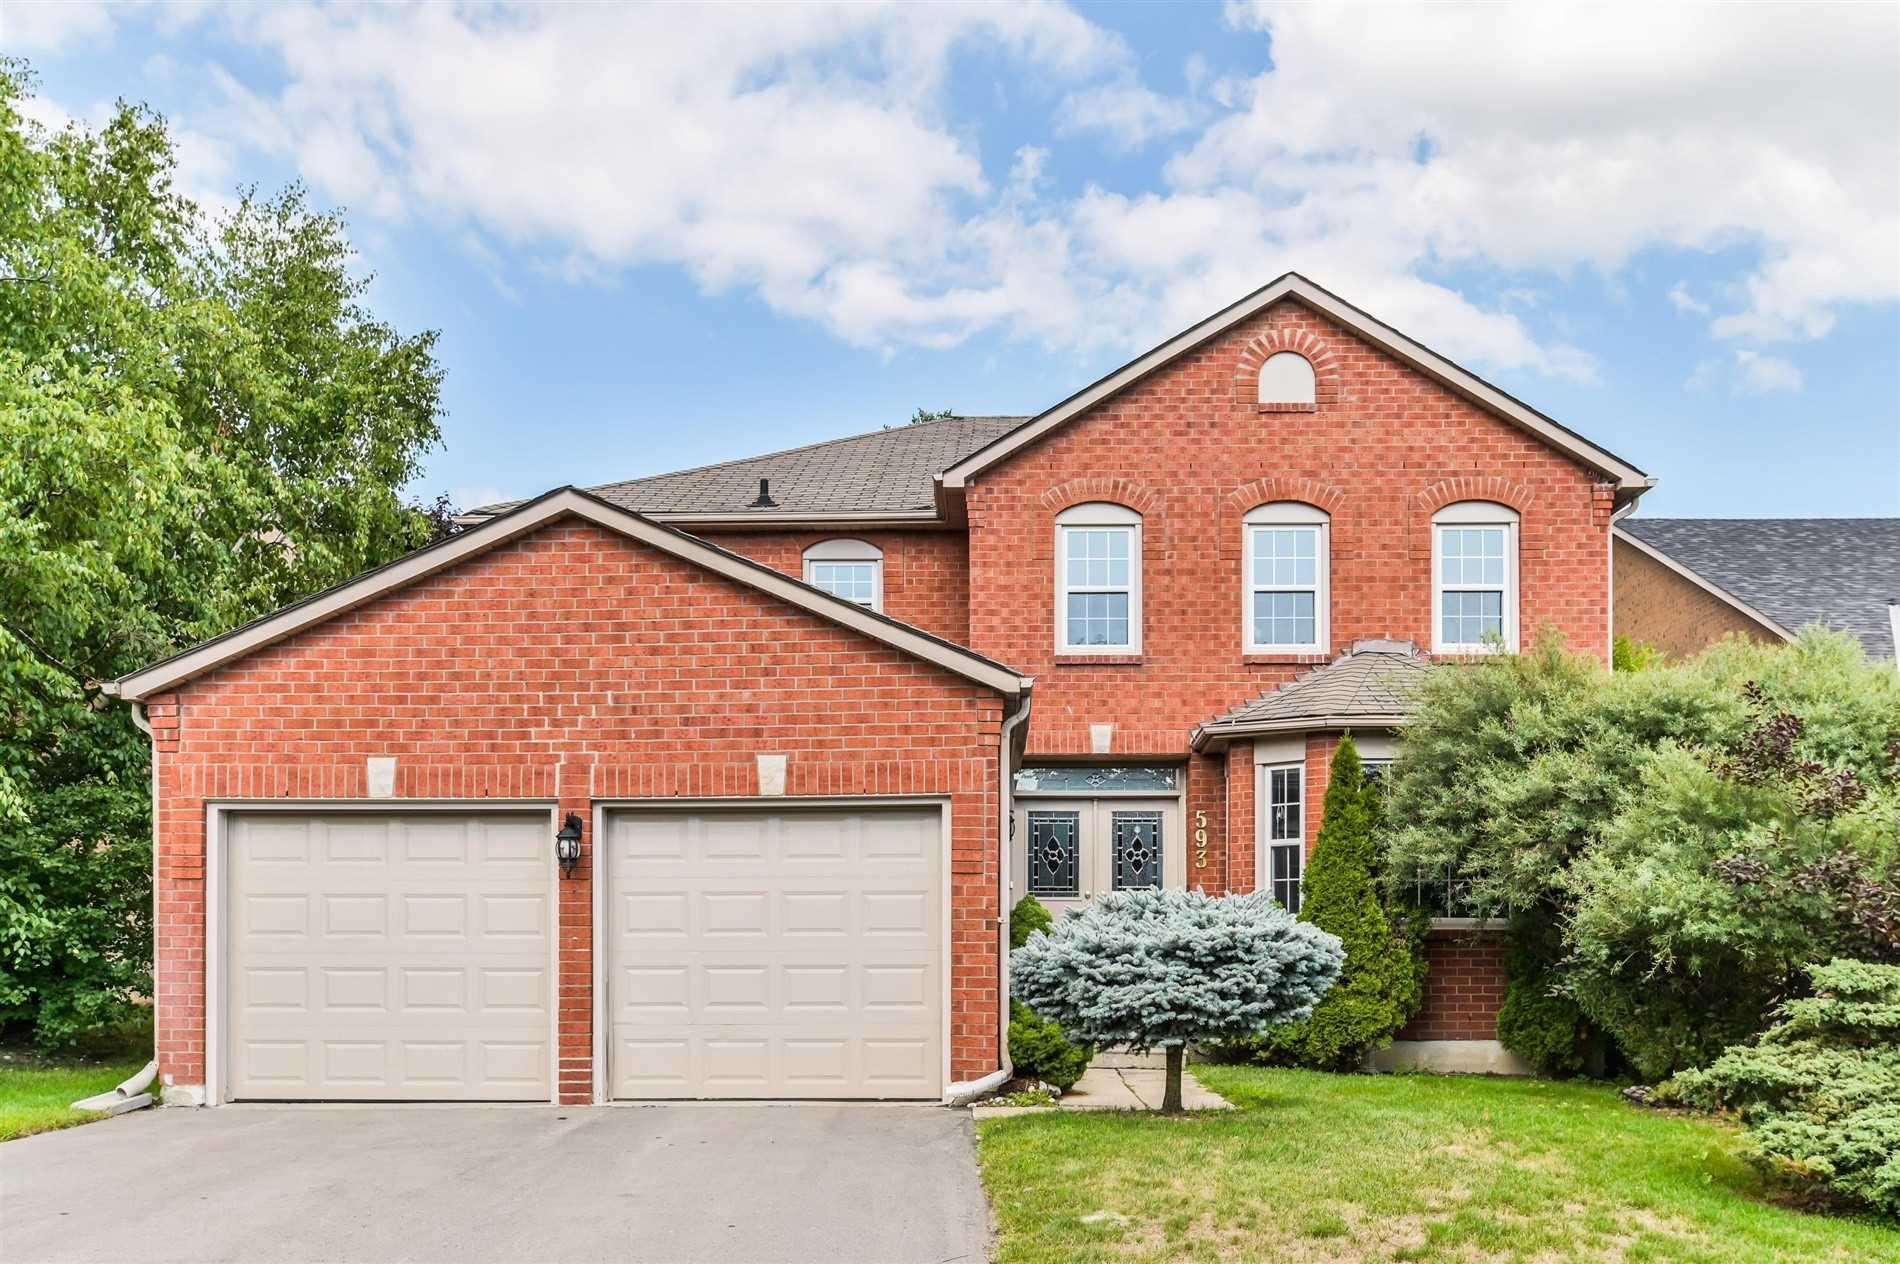 593 Village Pkwy, Markham Ontario, Canada